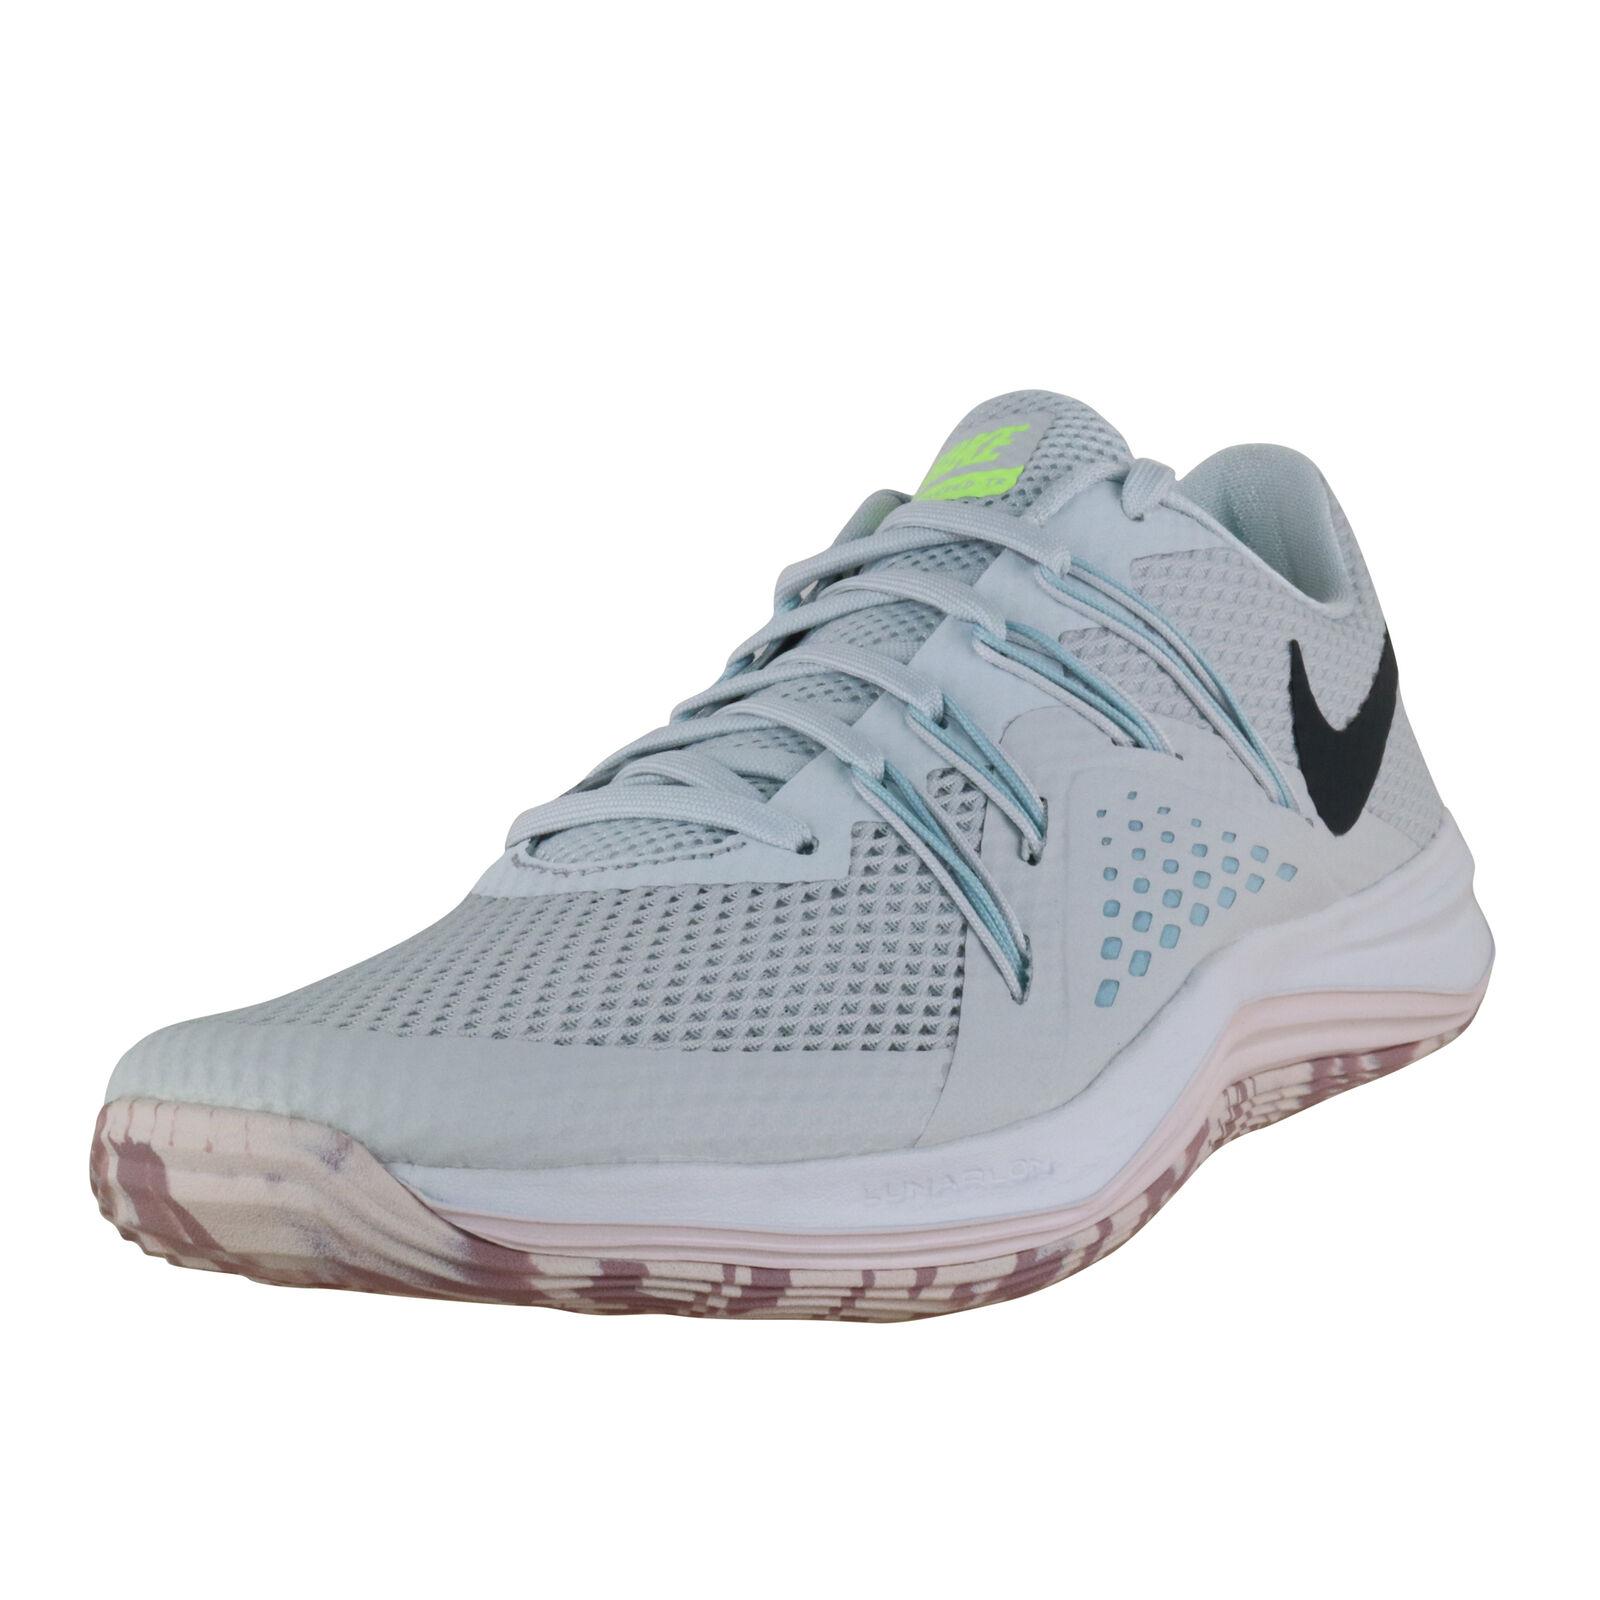 Nike Lunar Exceed 909017-040 TR Damens 909017-040 Exceed ff6ed0